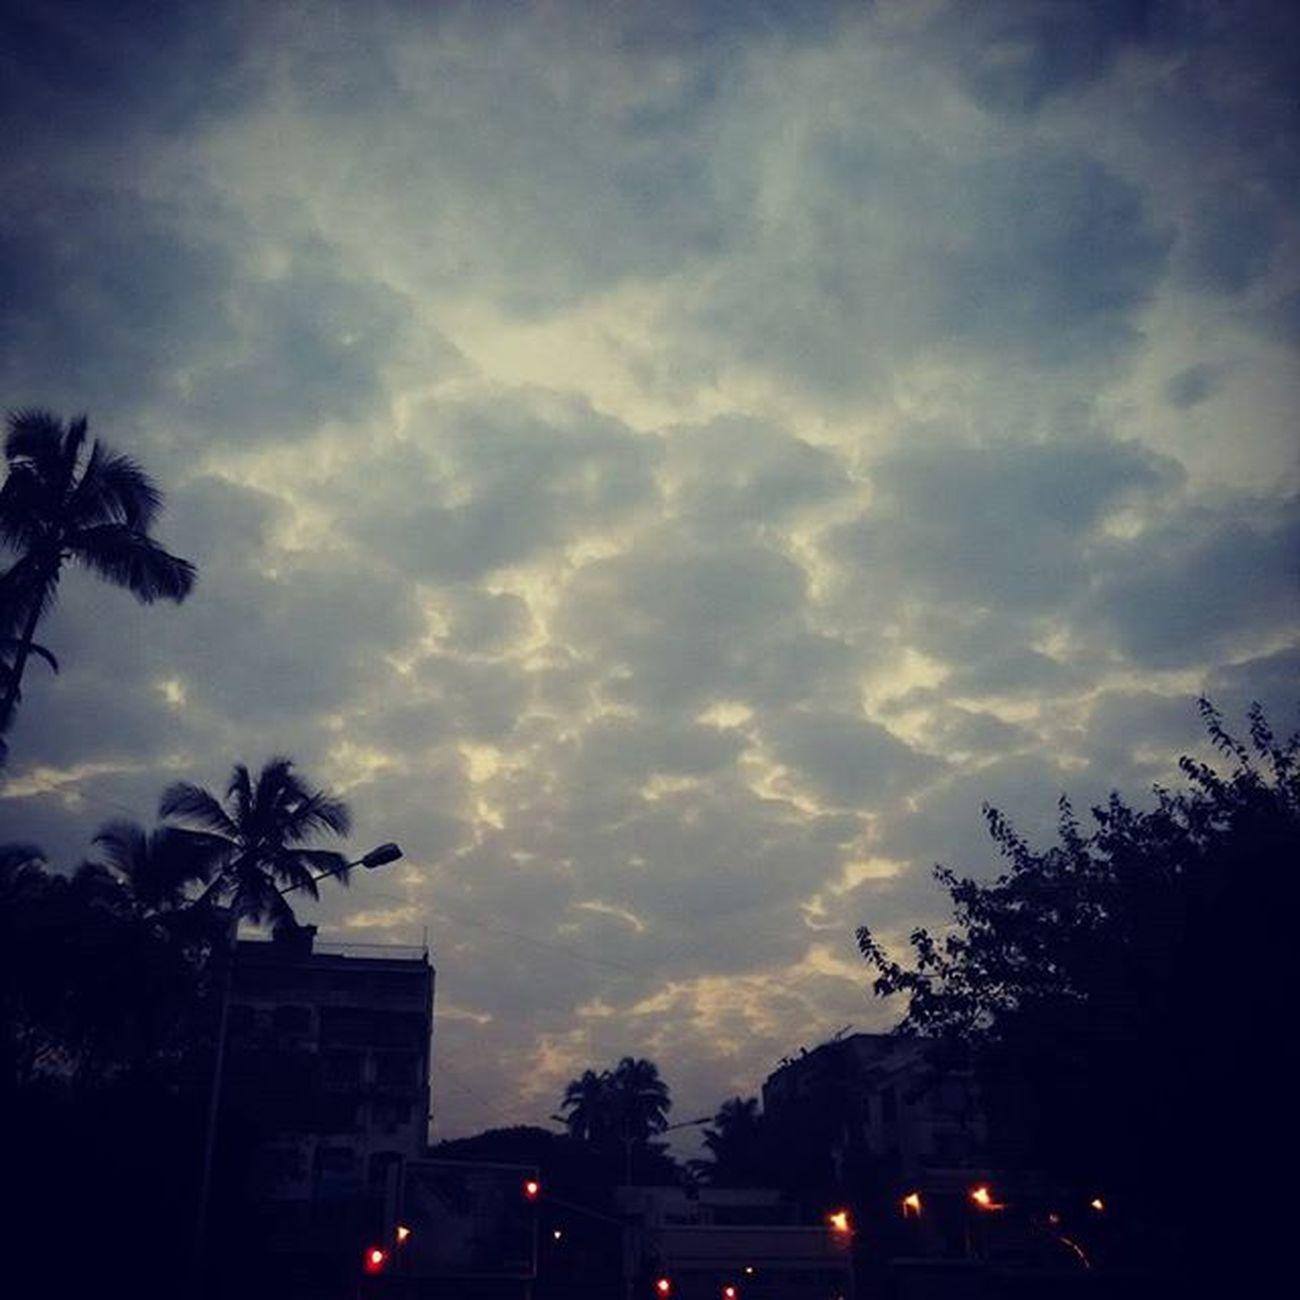 Morningclicks Amazingsky Clouds Justperfect LoveNature Beautifulview Instaclick Instamood